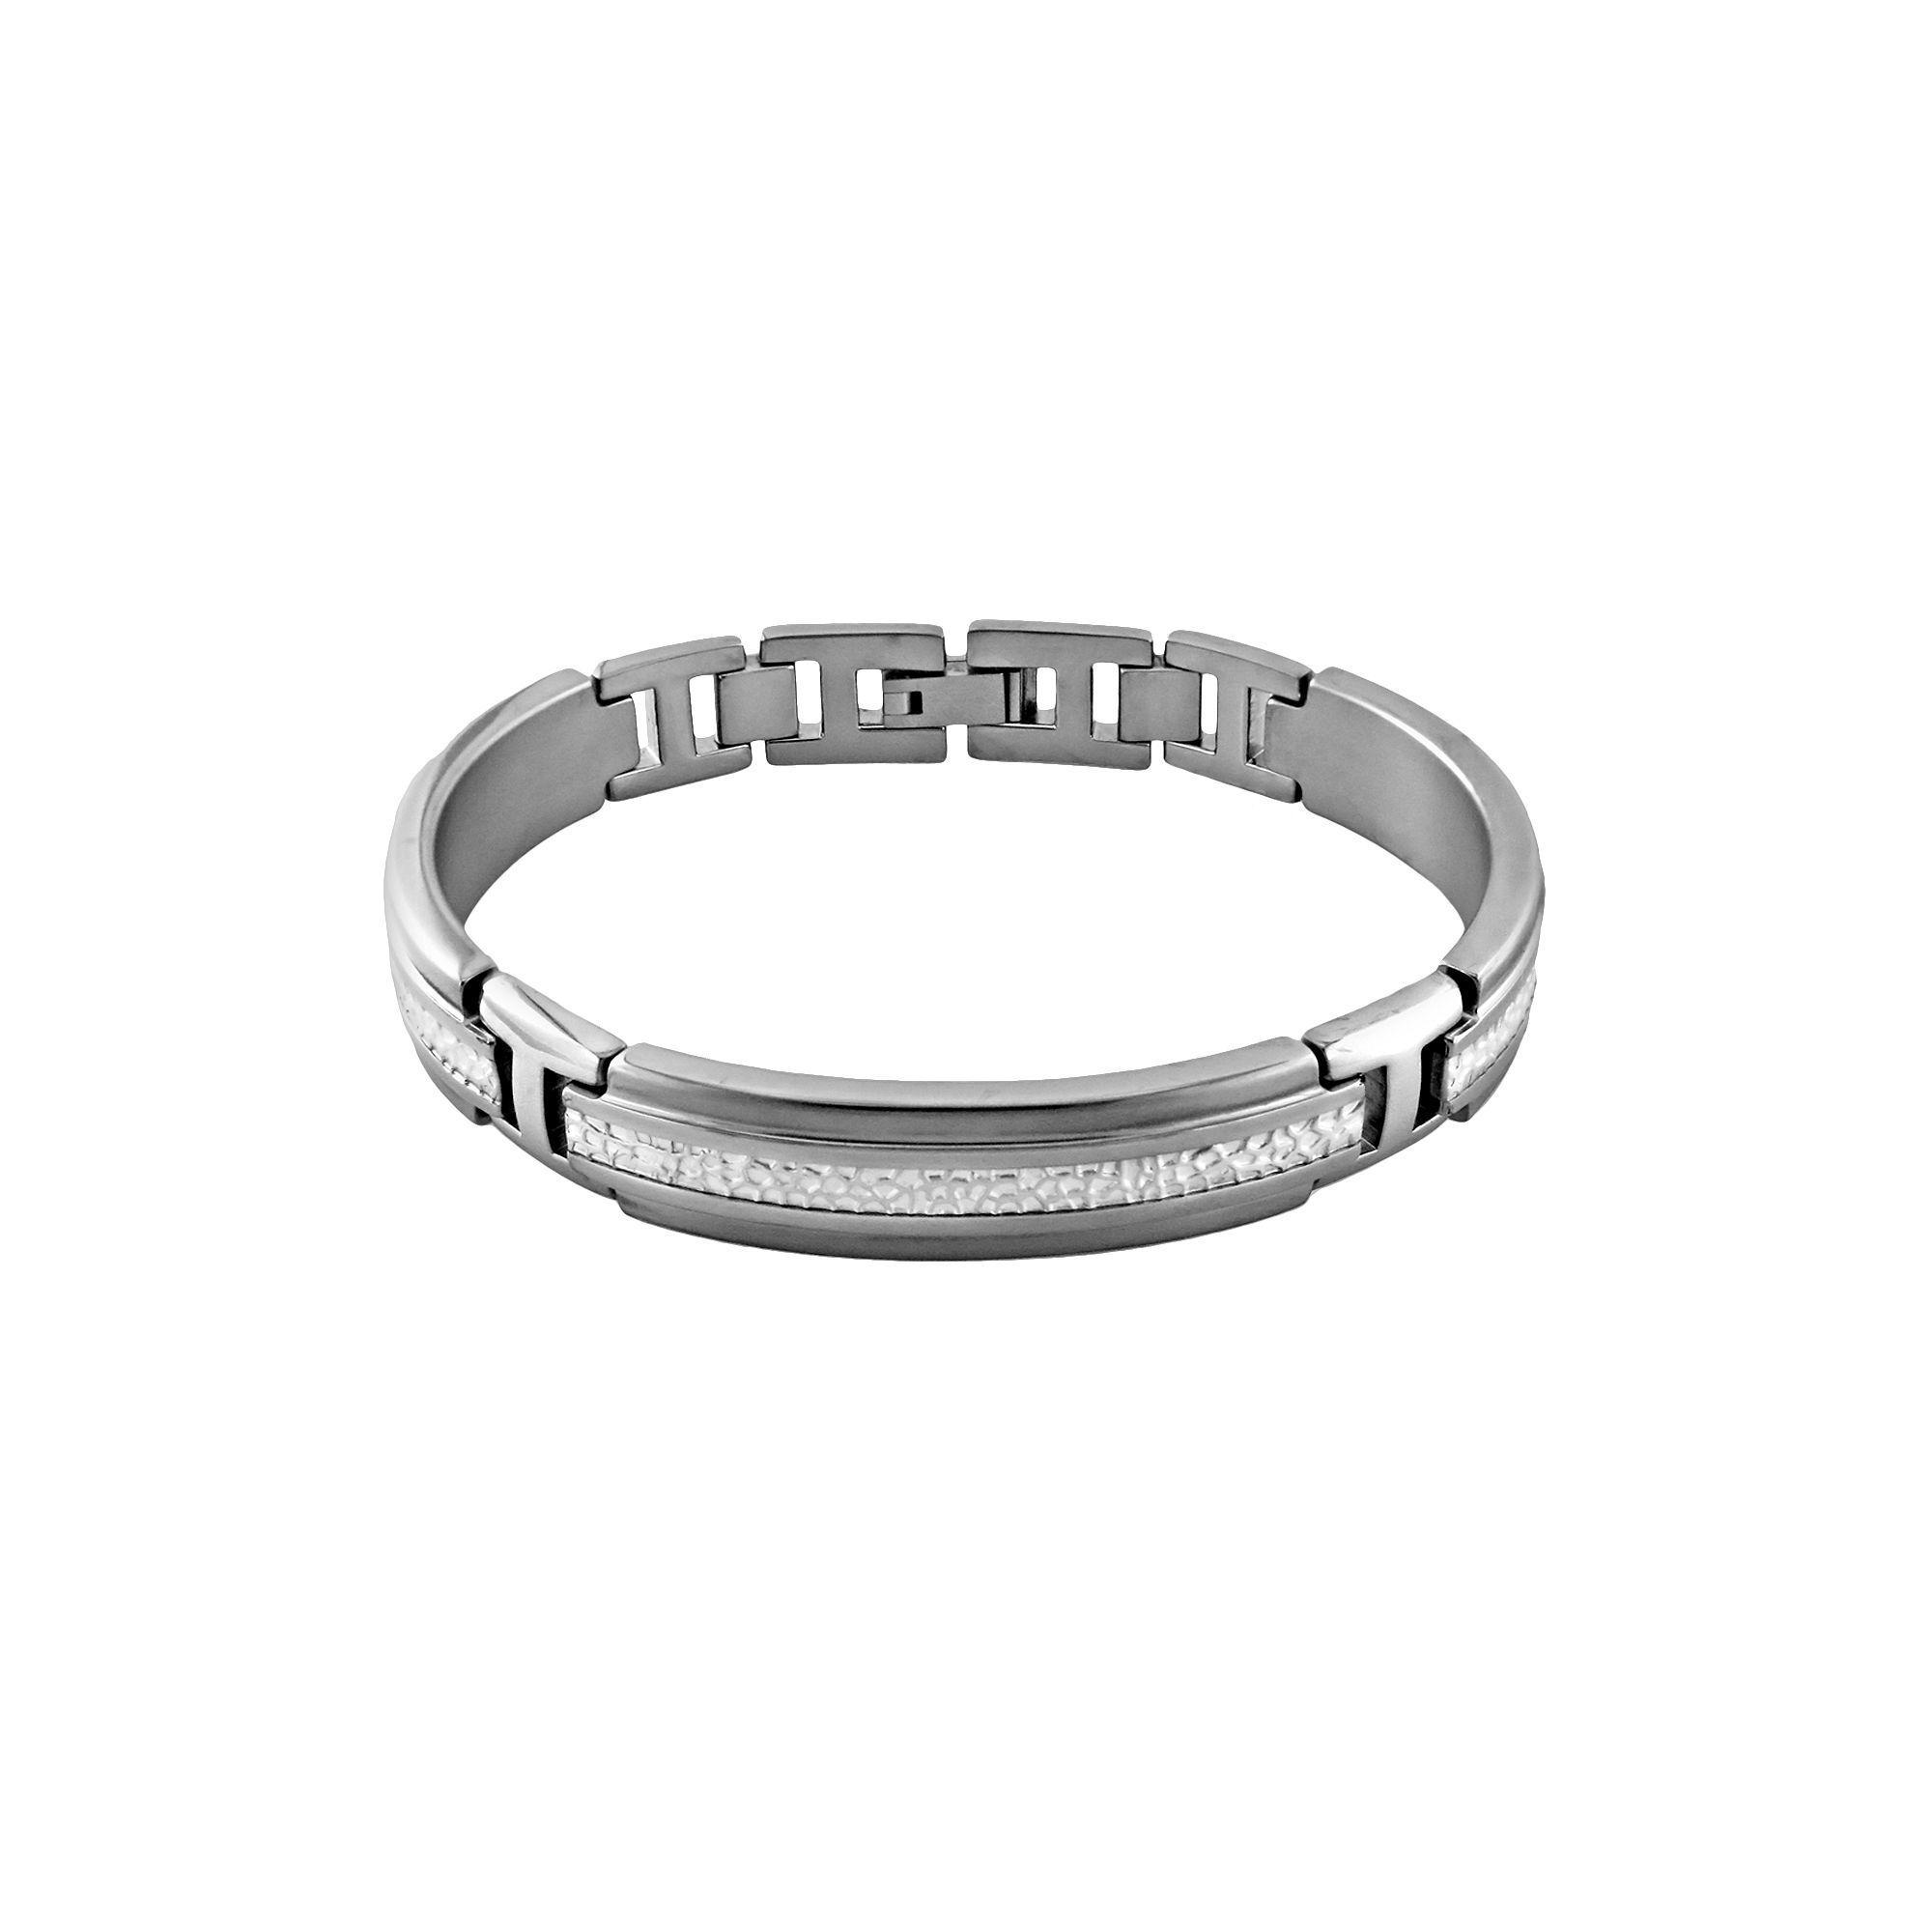 Sti by spectore sti by spectore titanium u sterling silver bracelet